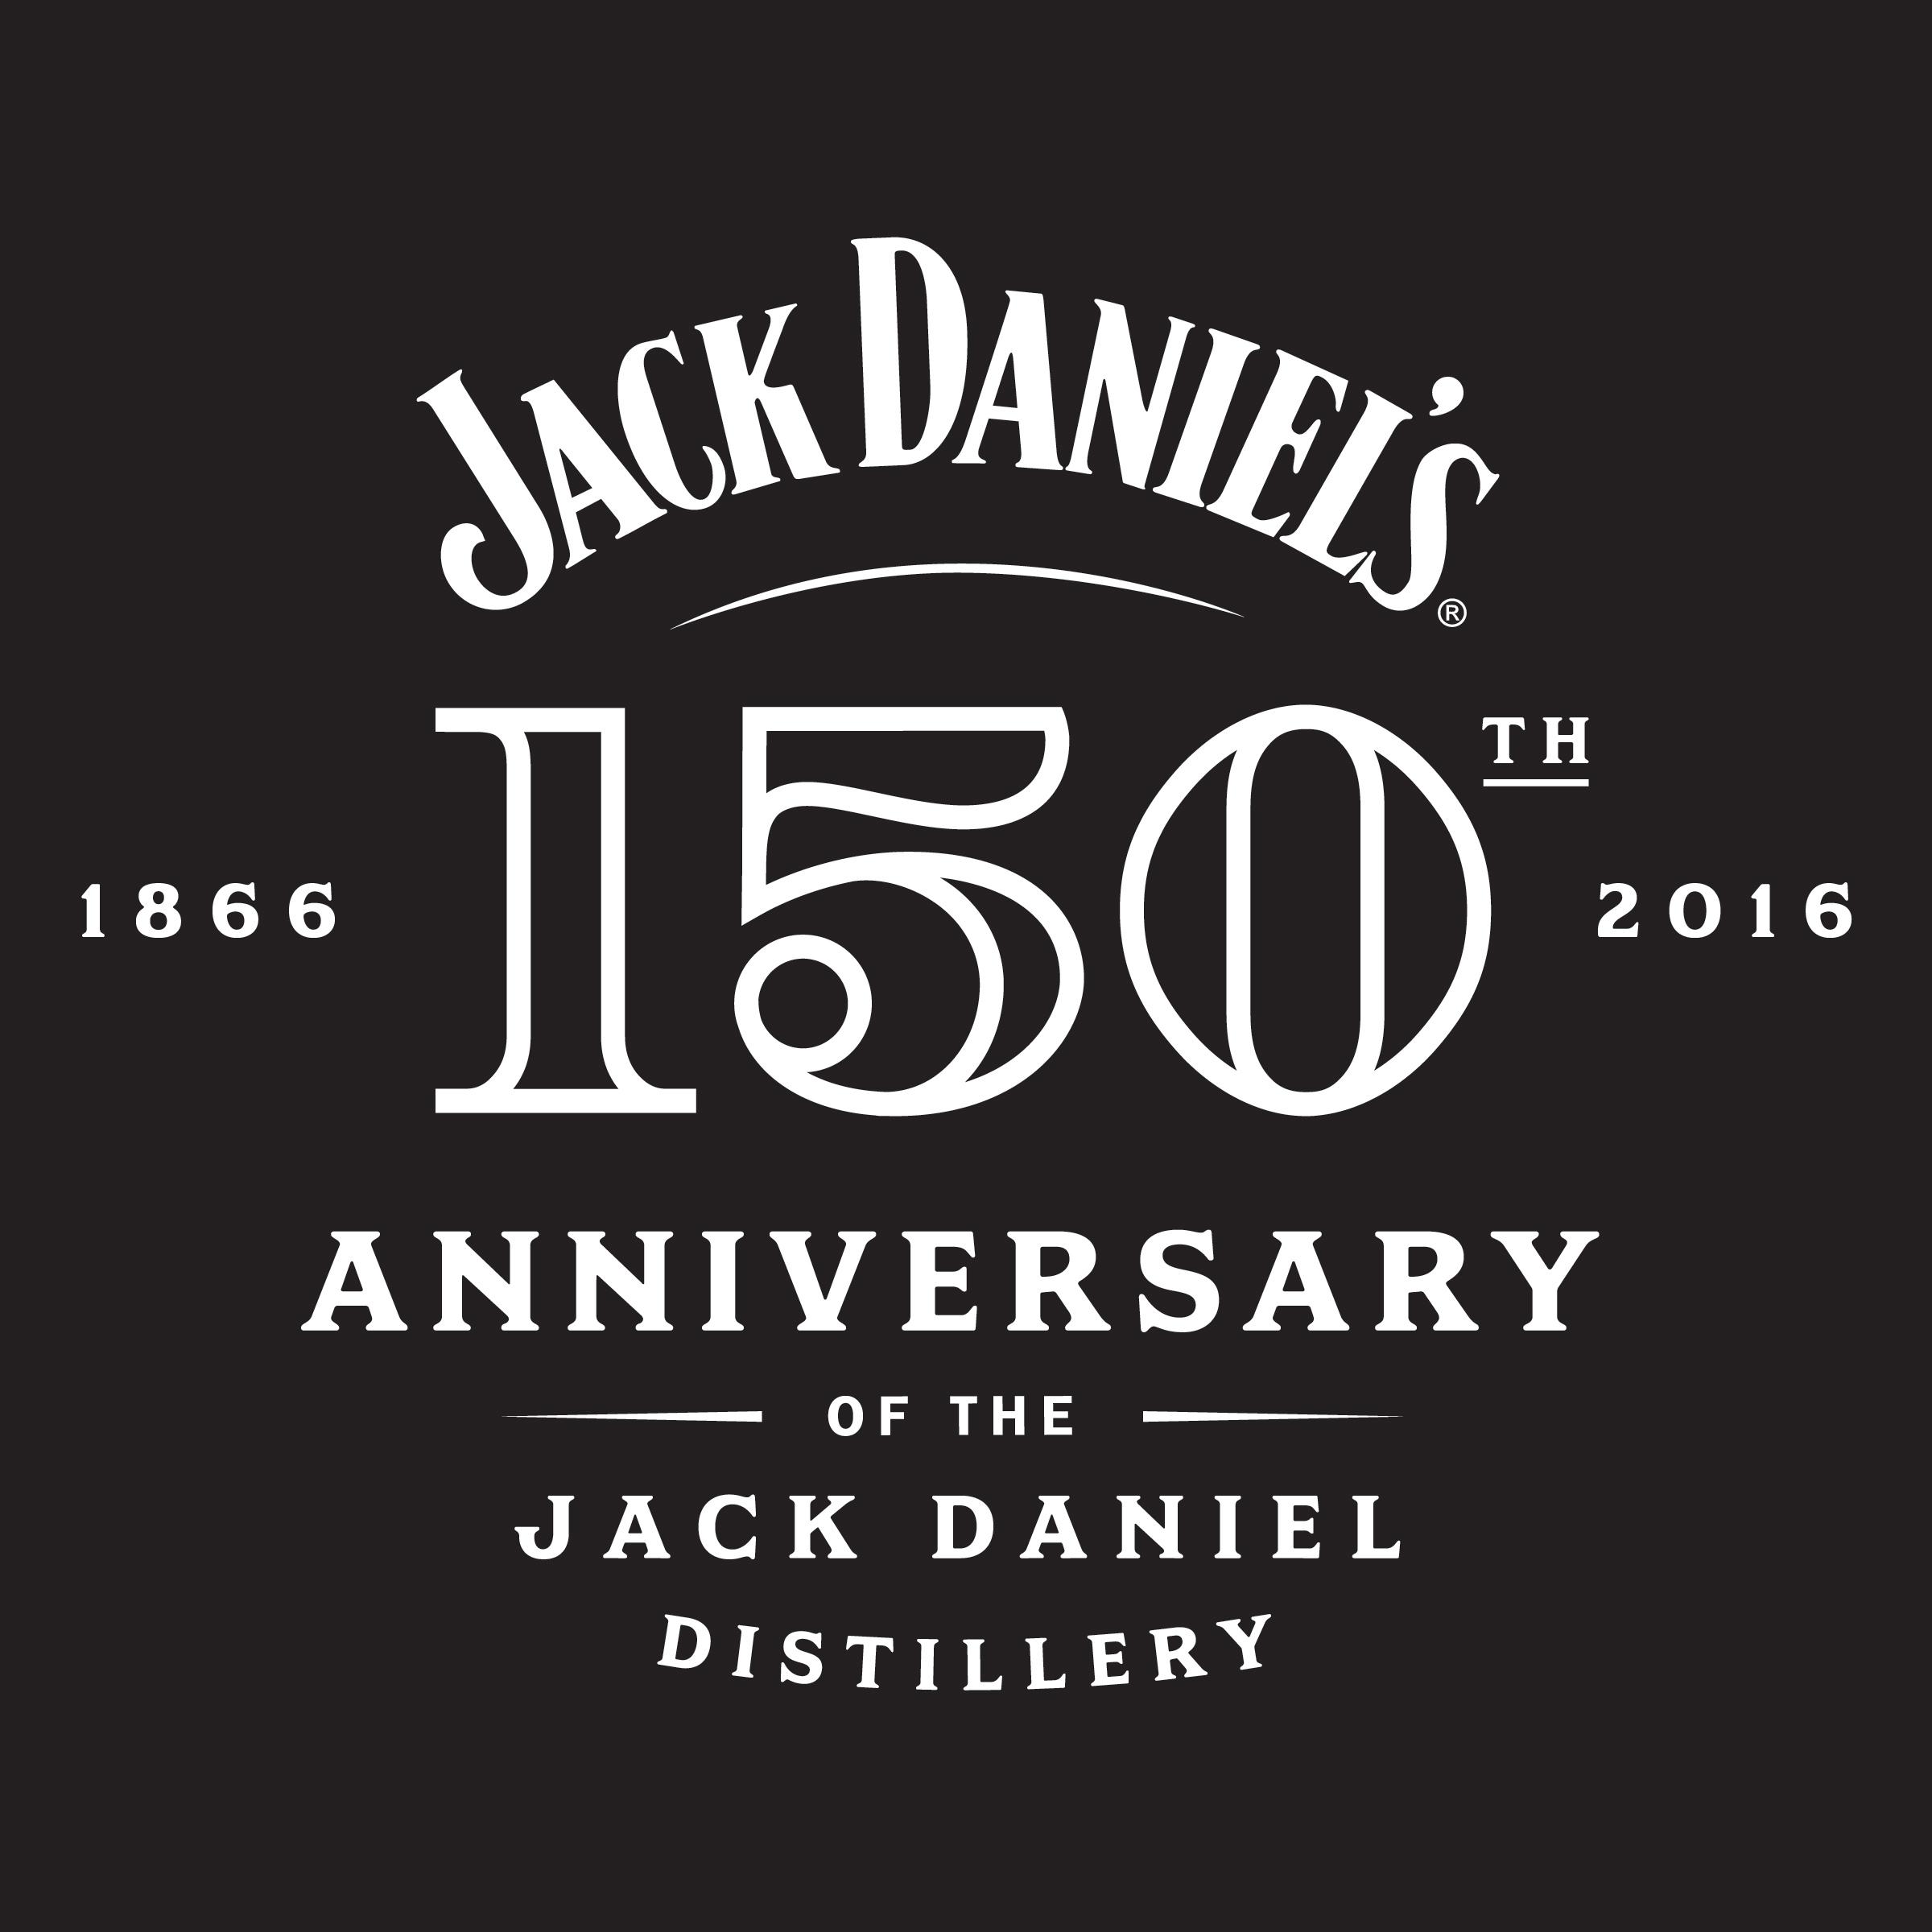 Make Your Own Jack Daniels Label